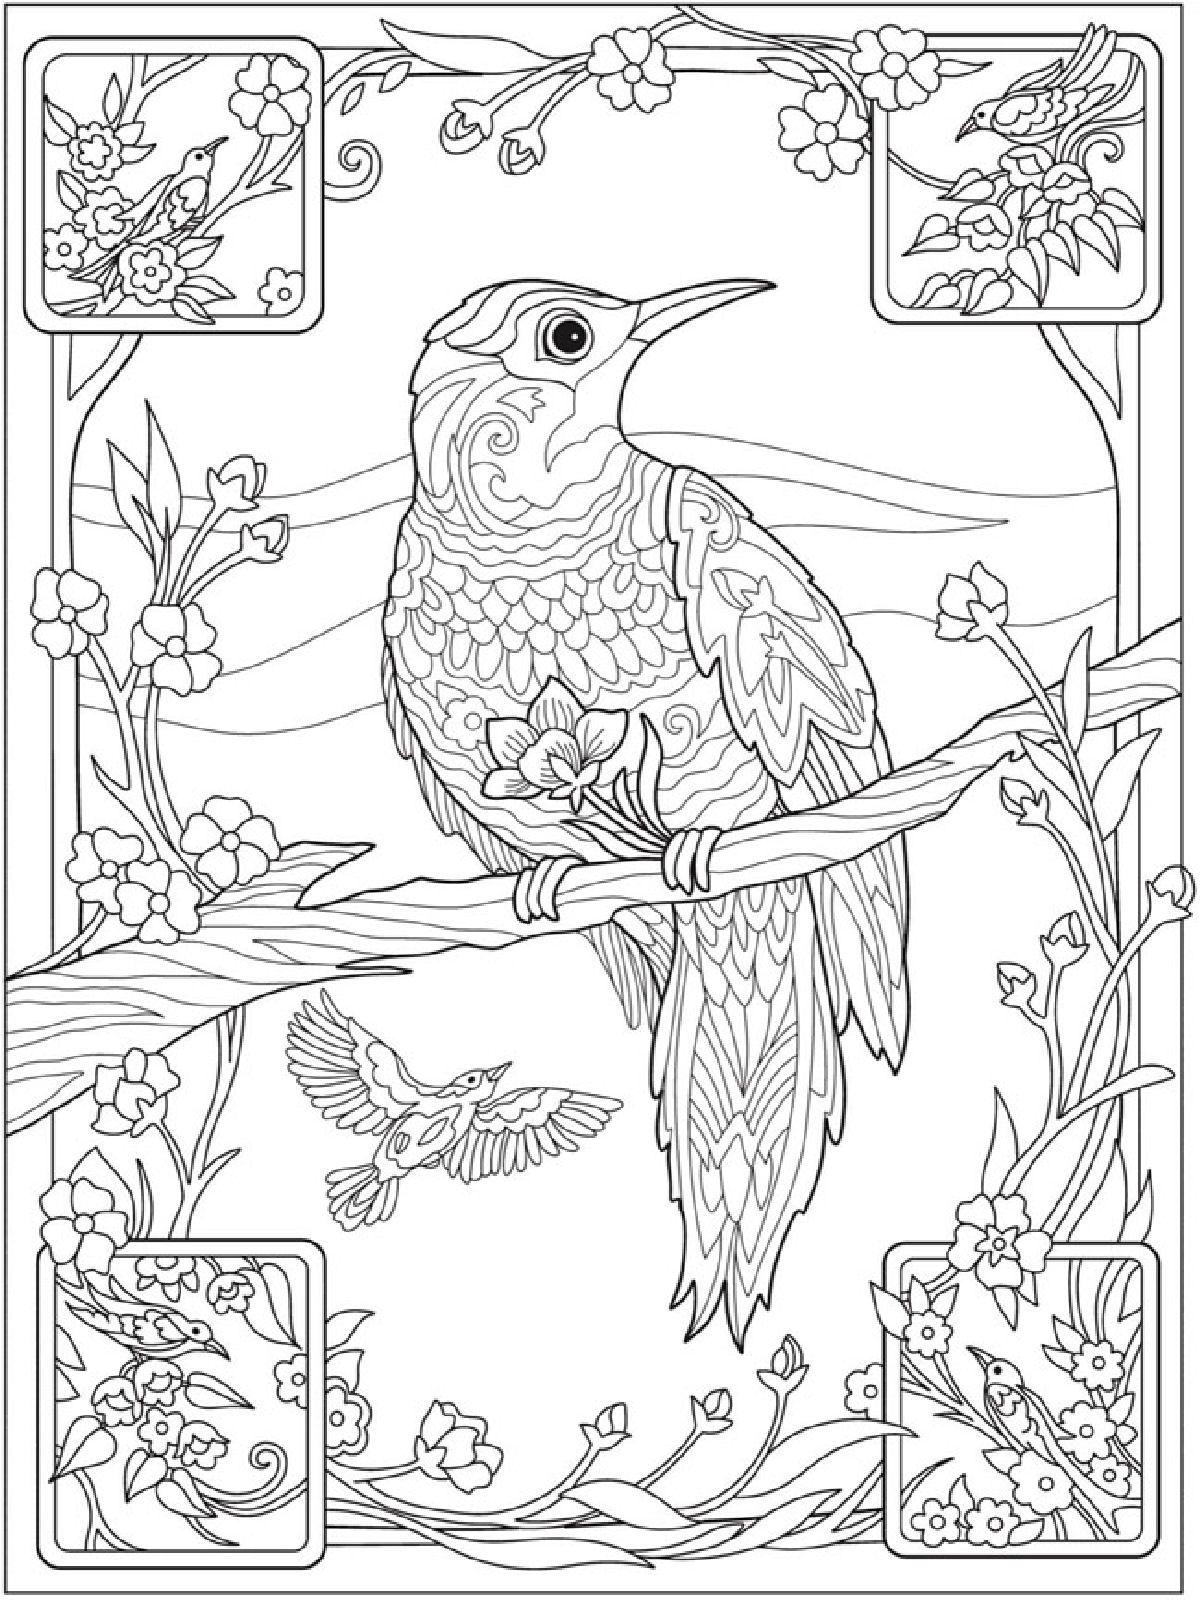 Creative Haven Vintage Hand Fans Coloring Book Dover Publications Creative Haven Coloring Books Coloring Pages Coloring Books